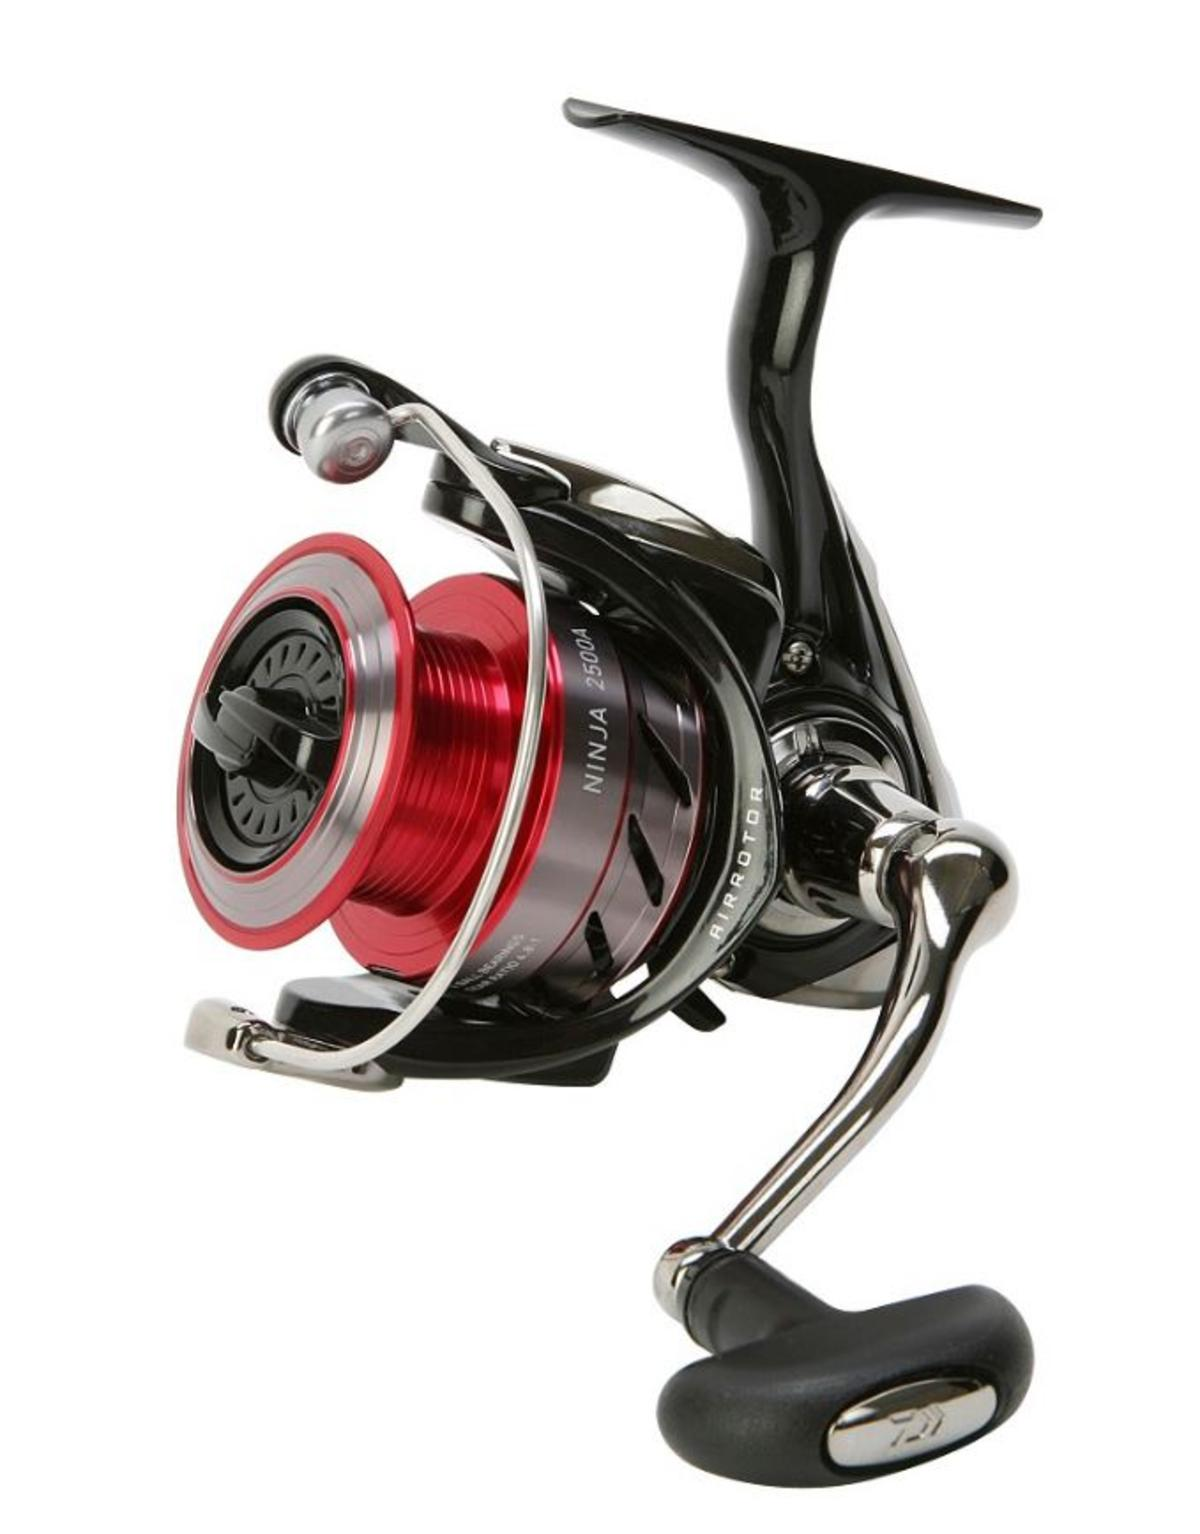 Ex Display Daiwa Ninja match 2508D Spinning Fishing Reel